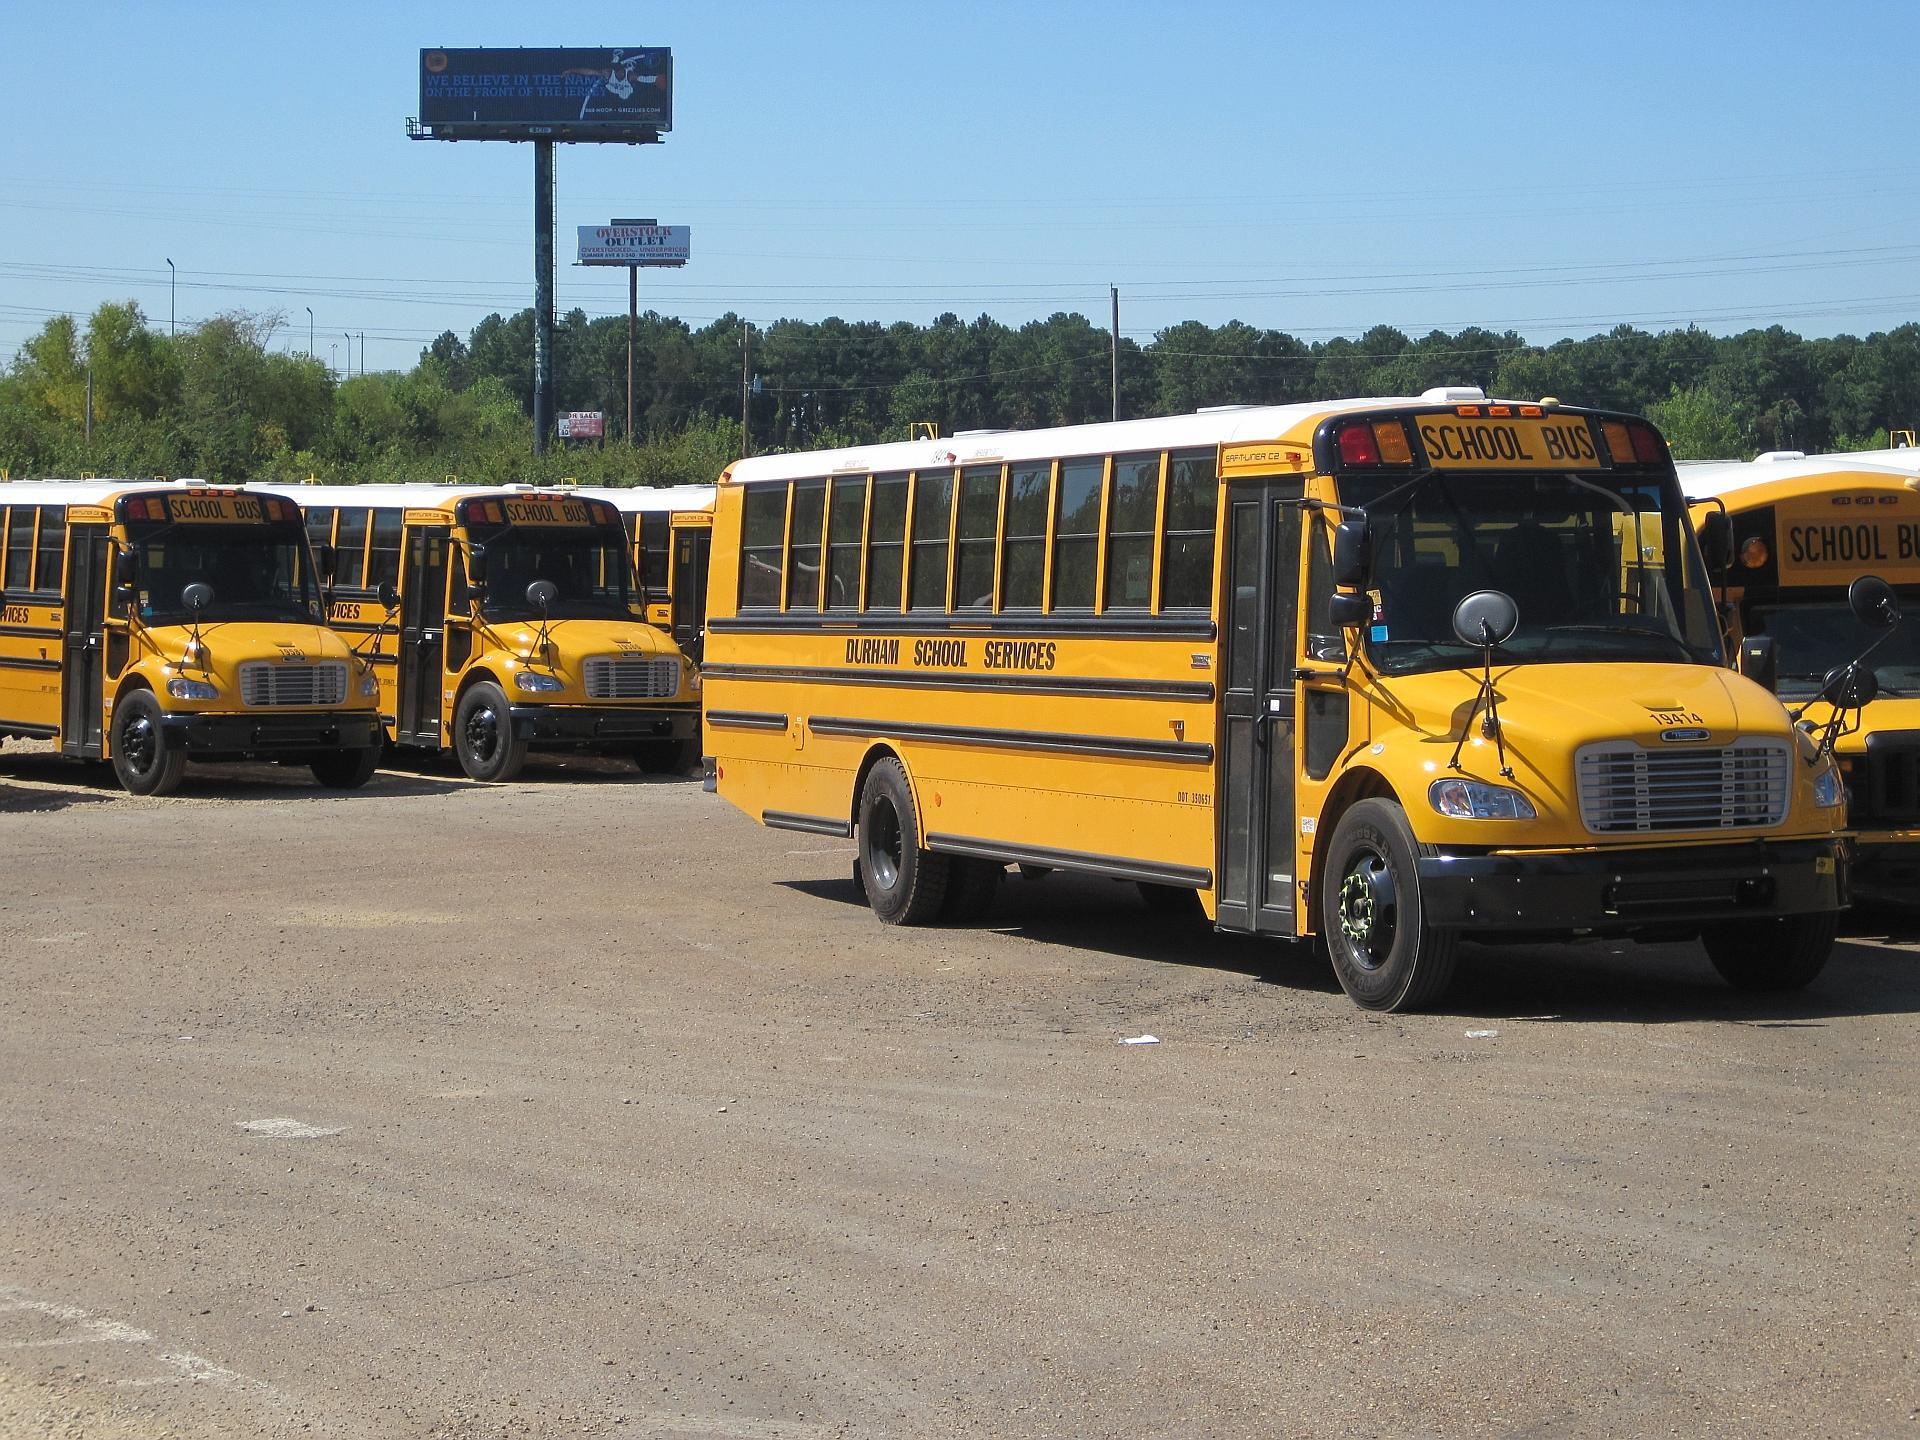 Description Durham school bus depot Shelby Oaks Dr Memphis TN 03.jpg